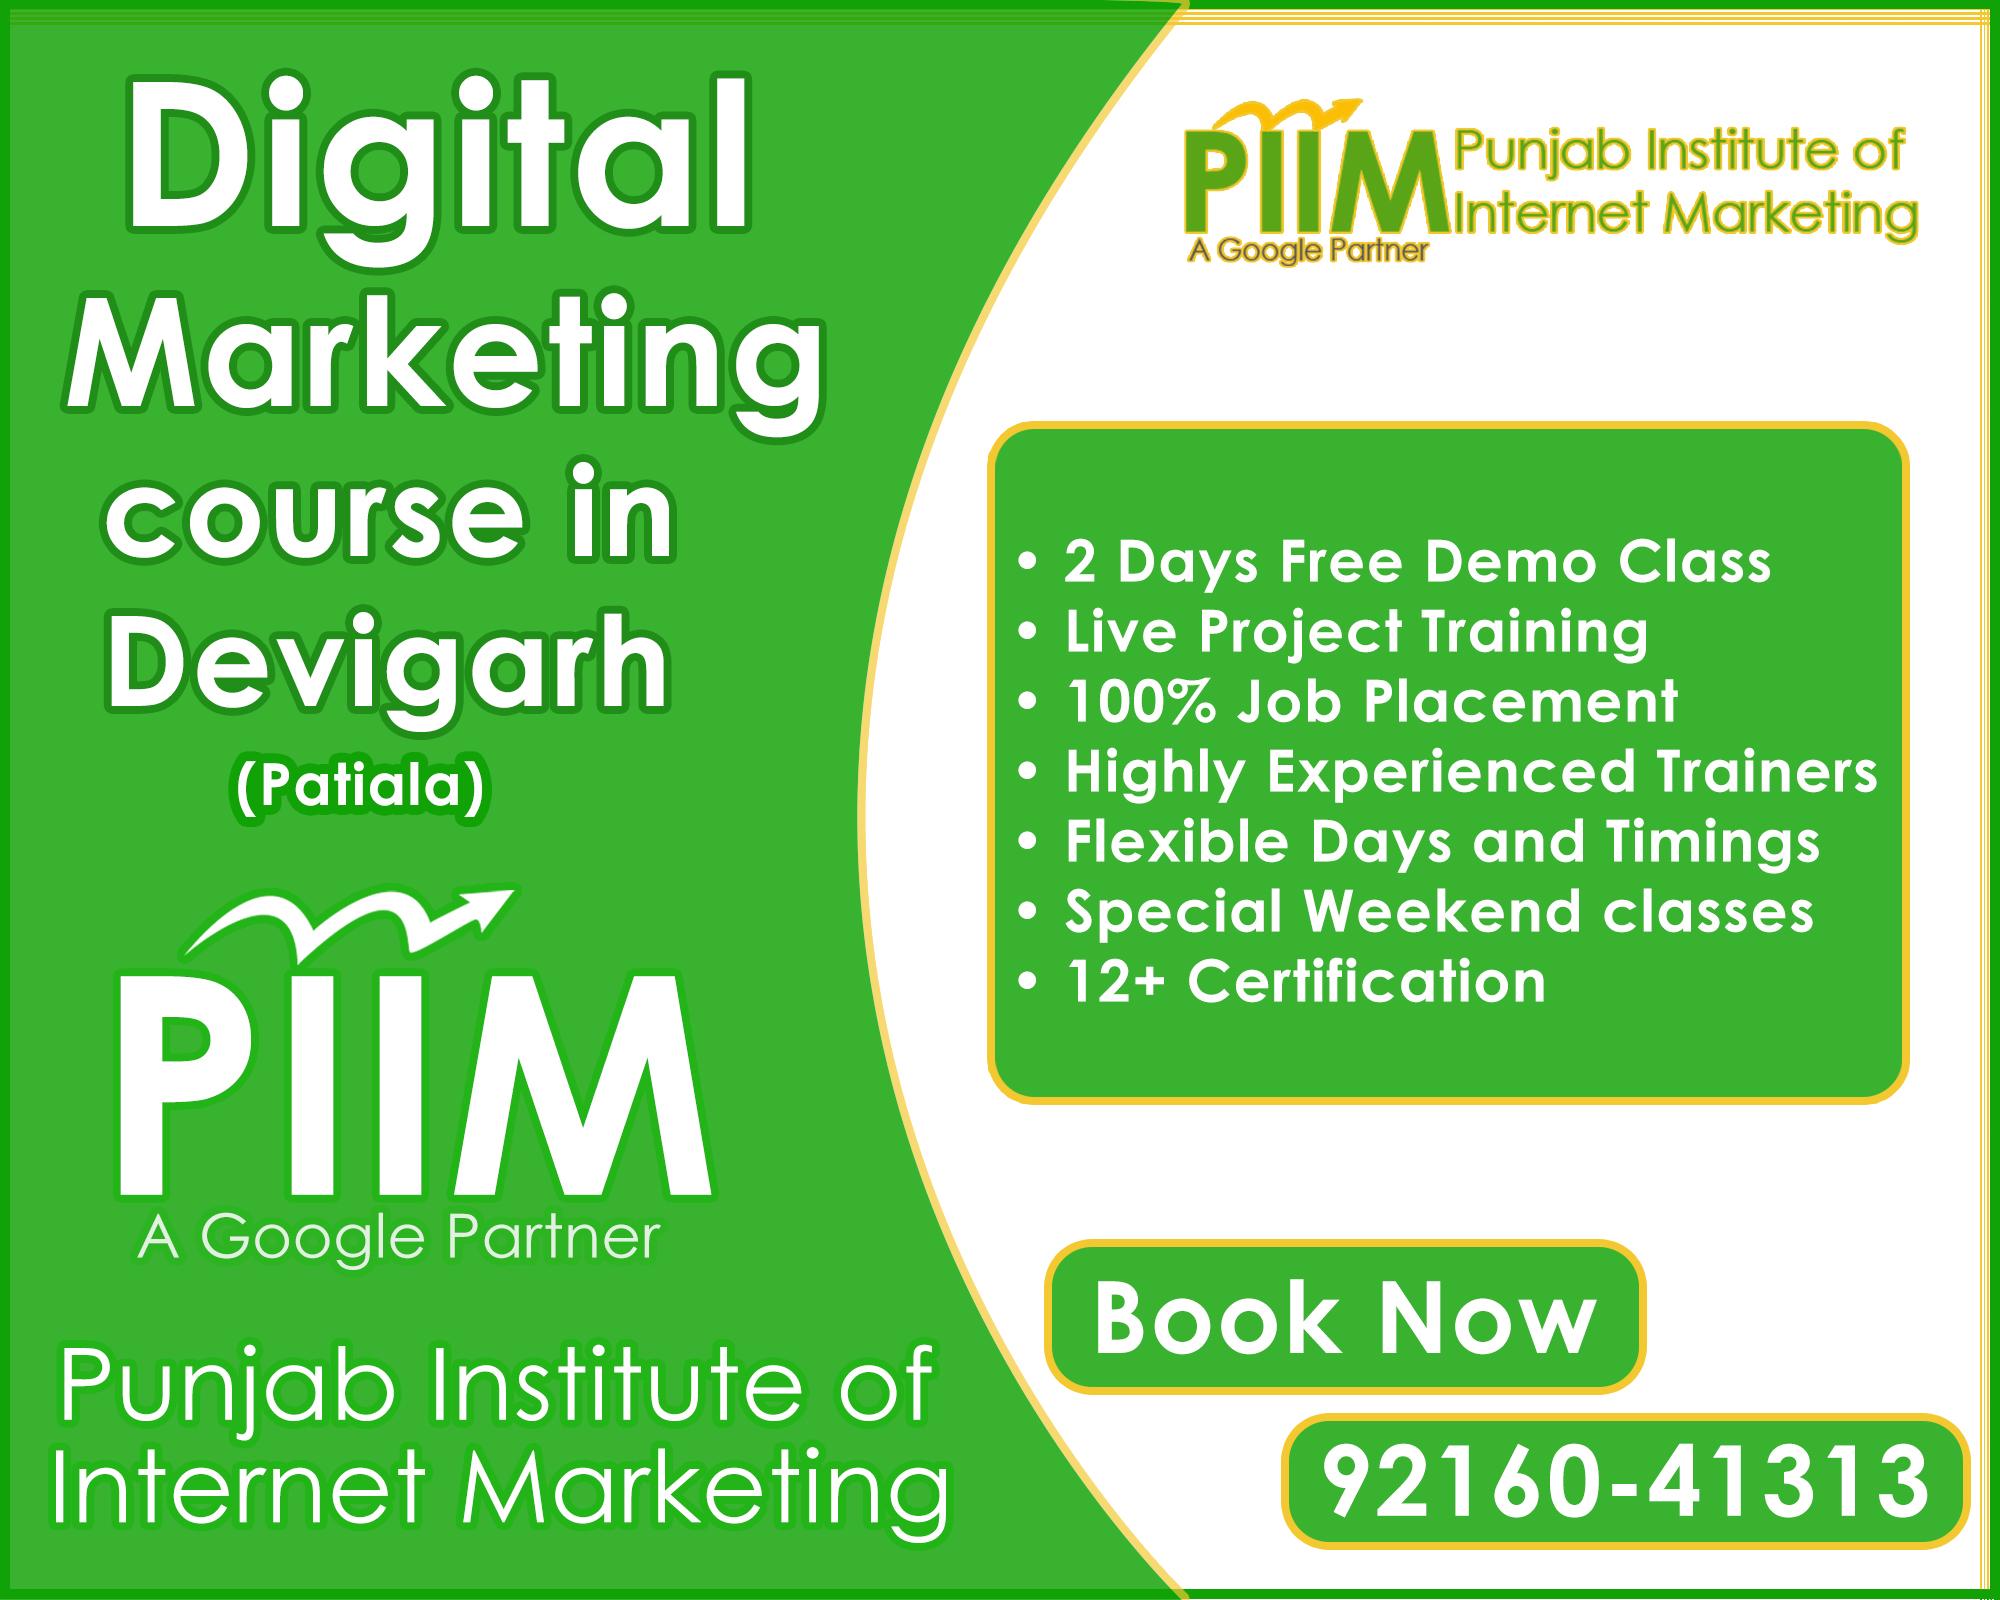 Digital Marketing Course in Devigarh